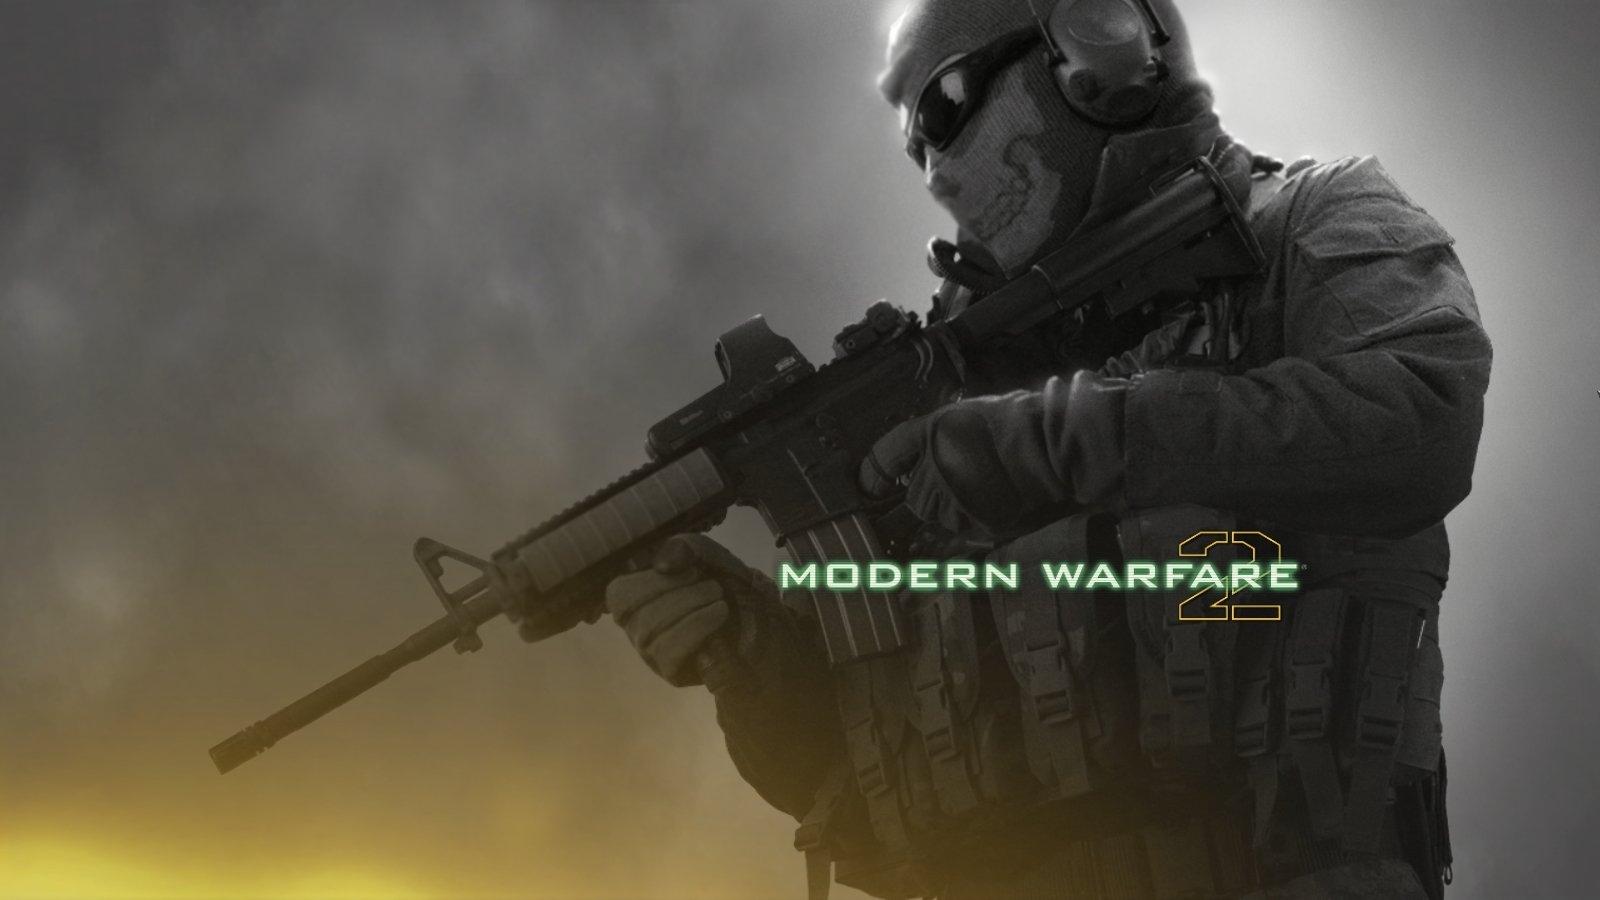 call of duty: modern warfare 2 fond d'écran and arrière-plan